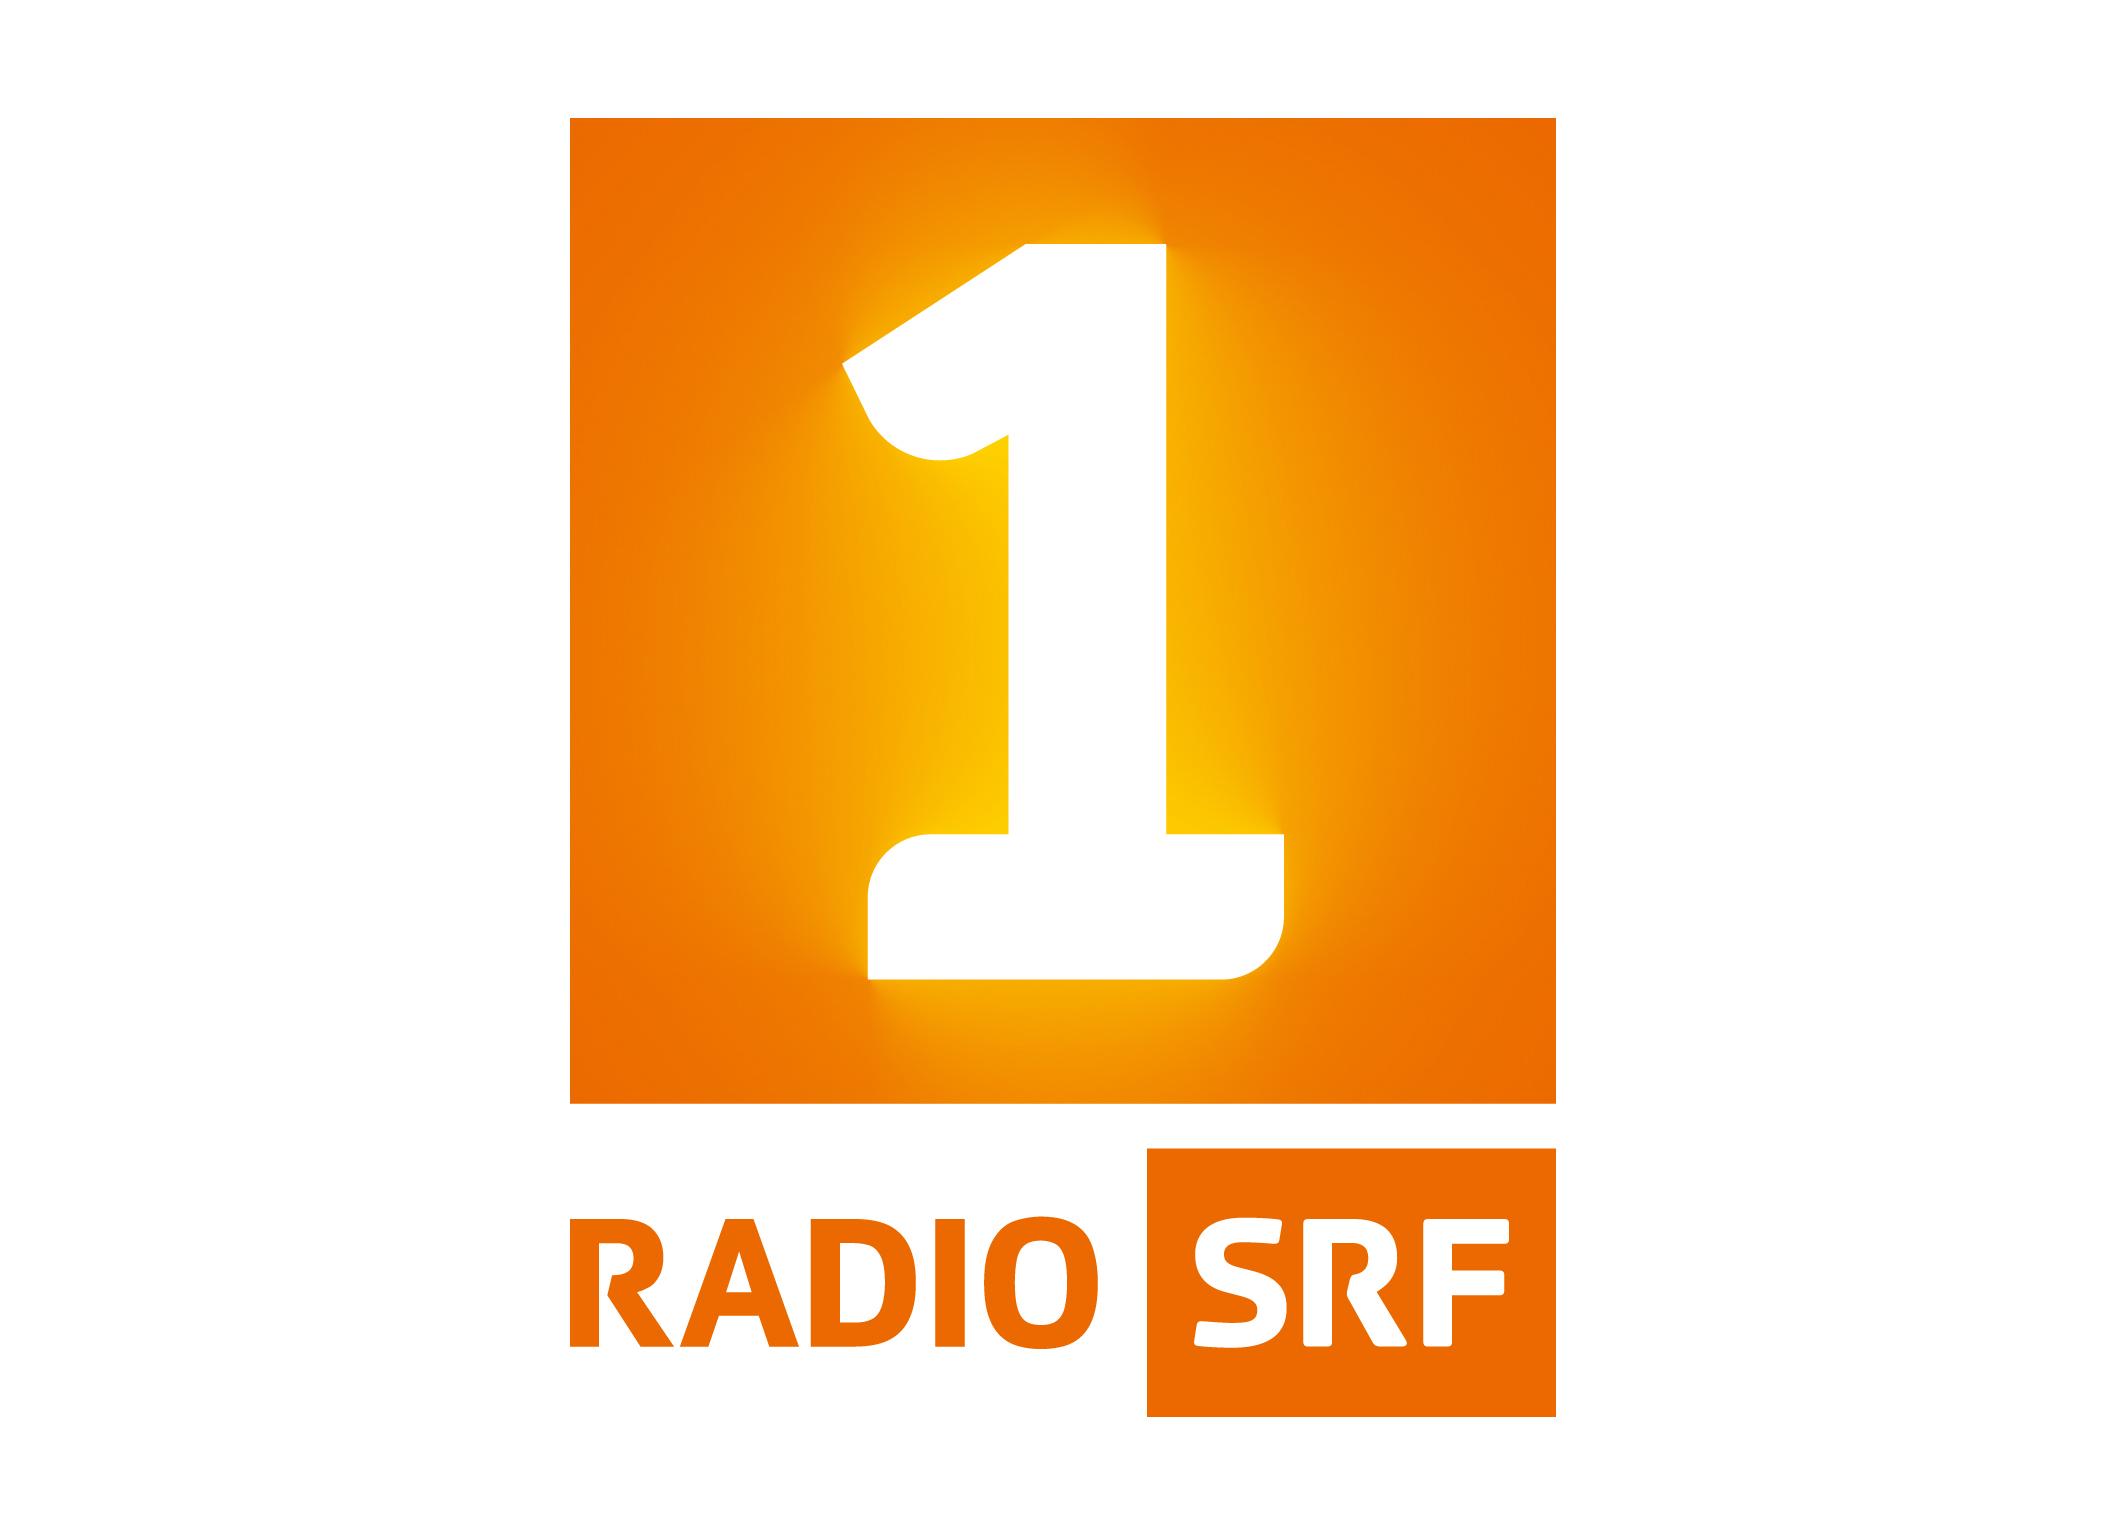 Programm Radio